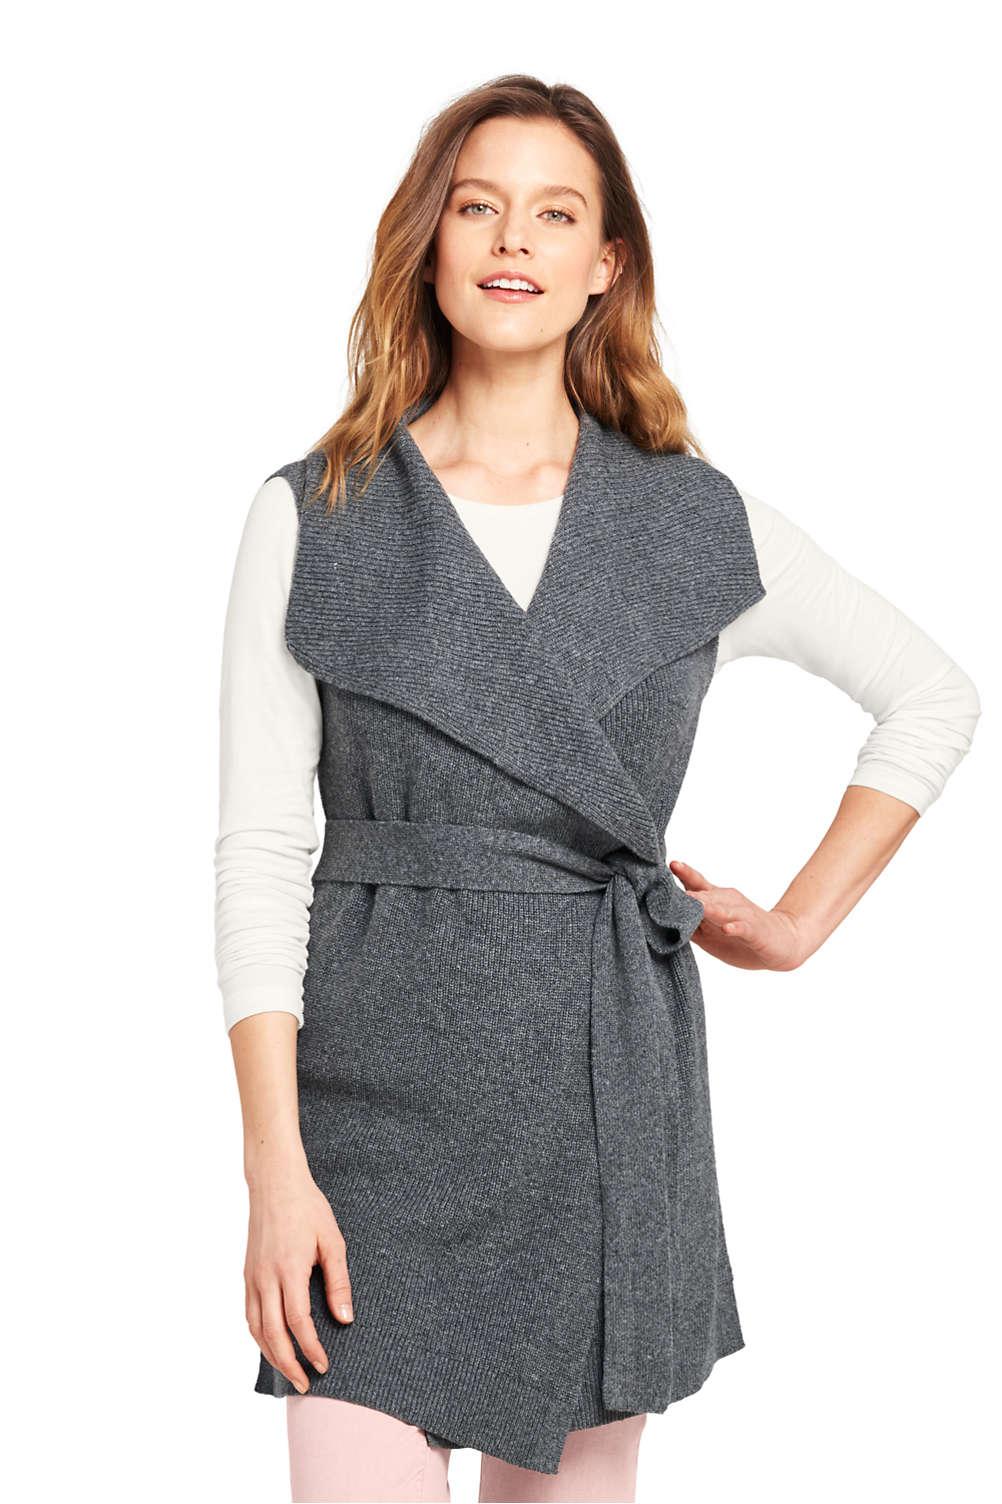 db4be22da0e0 Women's Sleeveless Lofty Blend Tie Sweater Vest from Lands' End